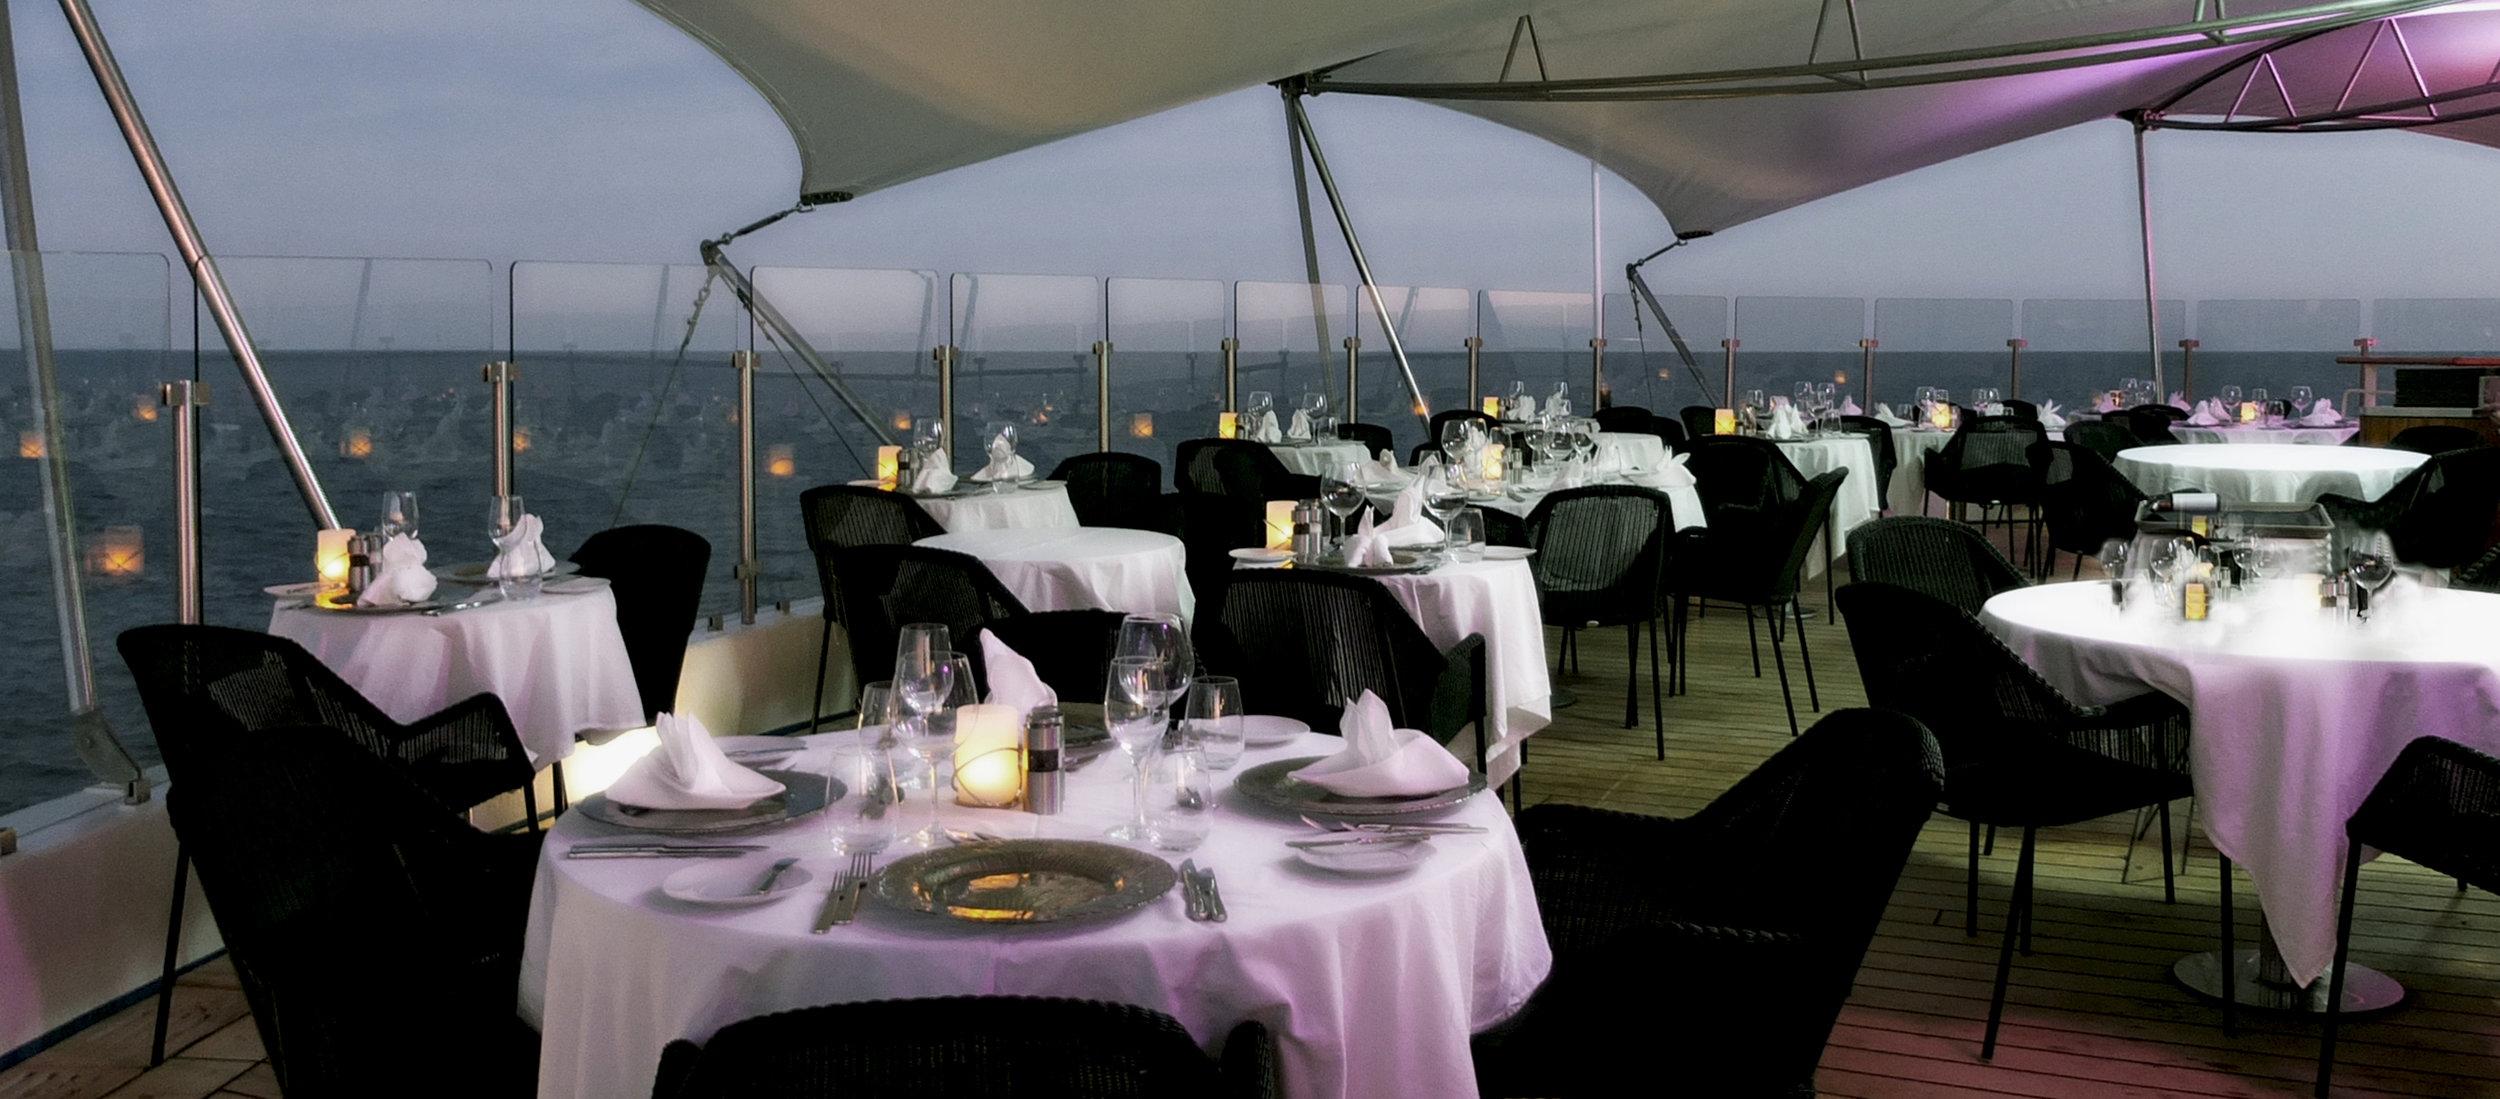 O_Dining Area_001.JPG